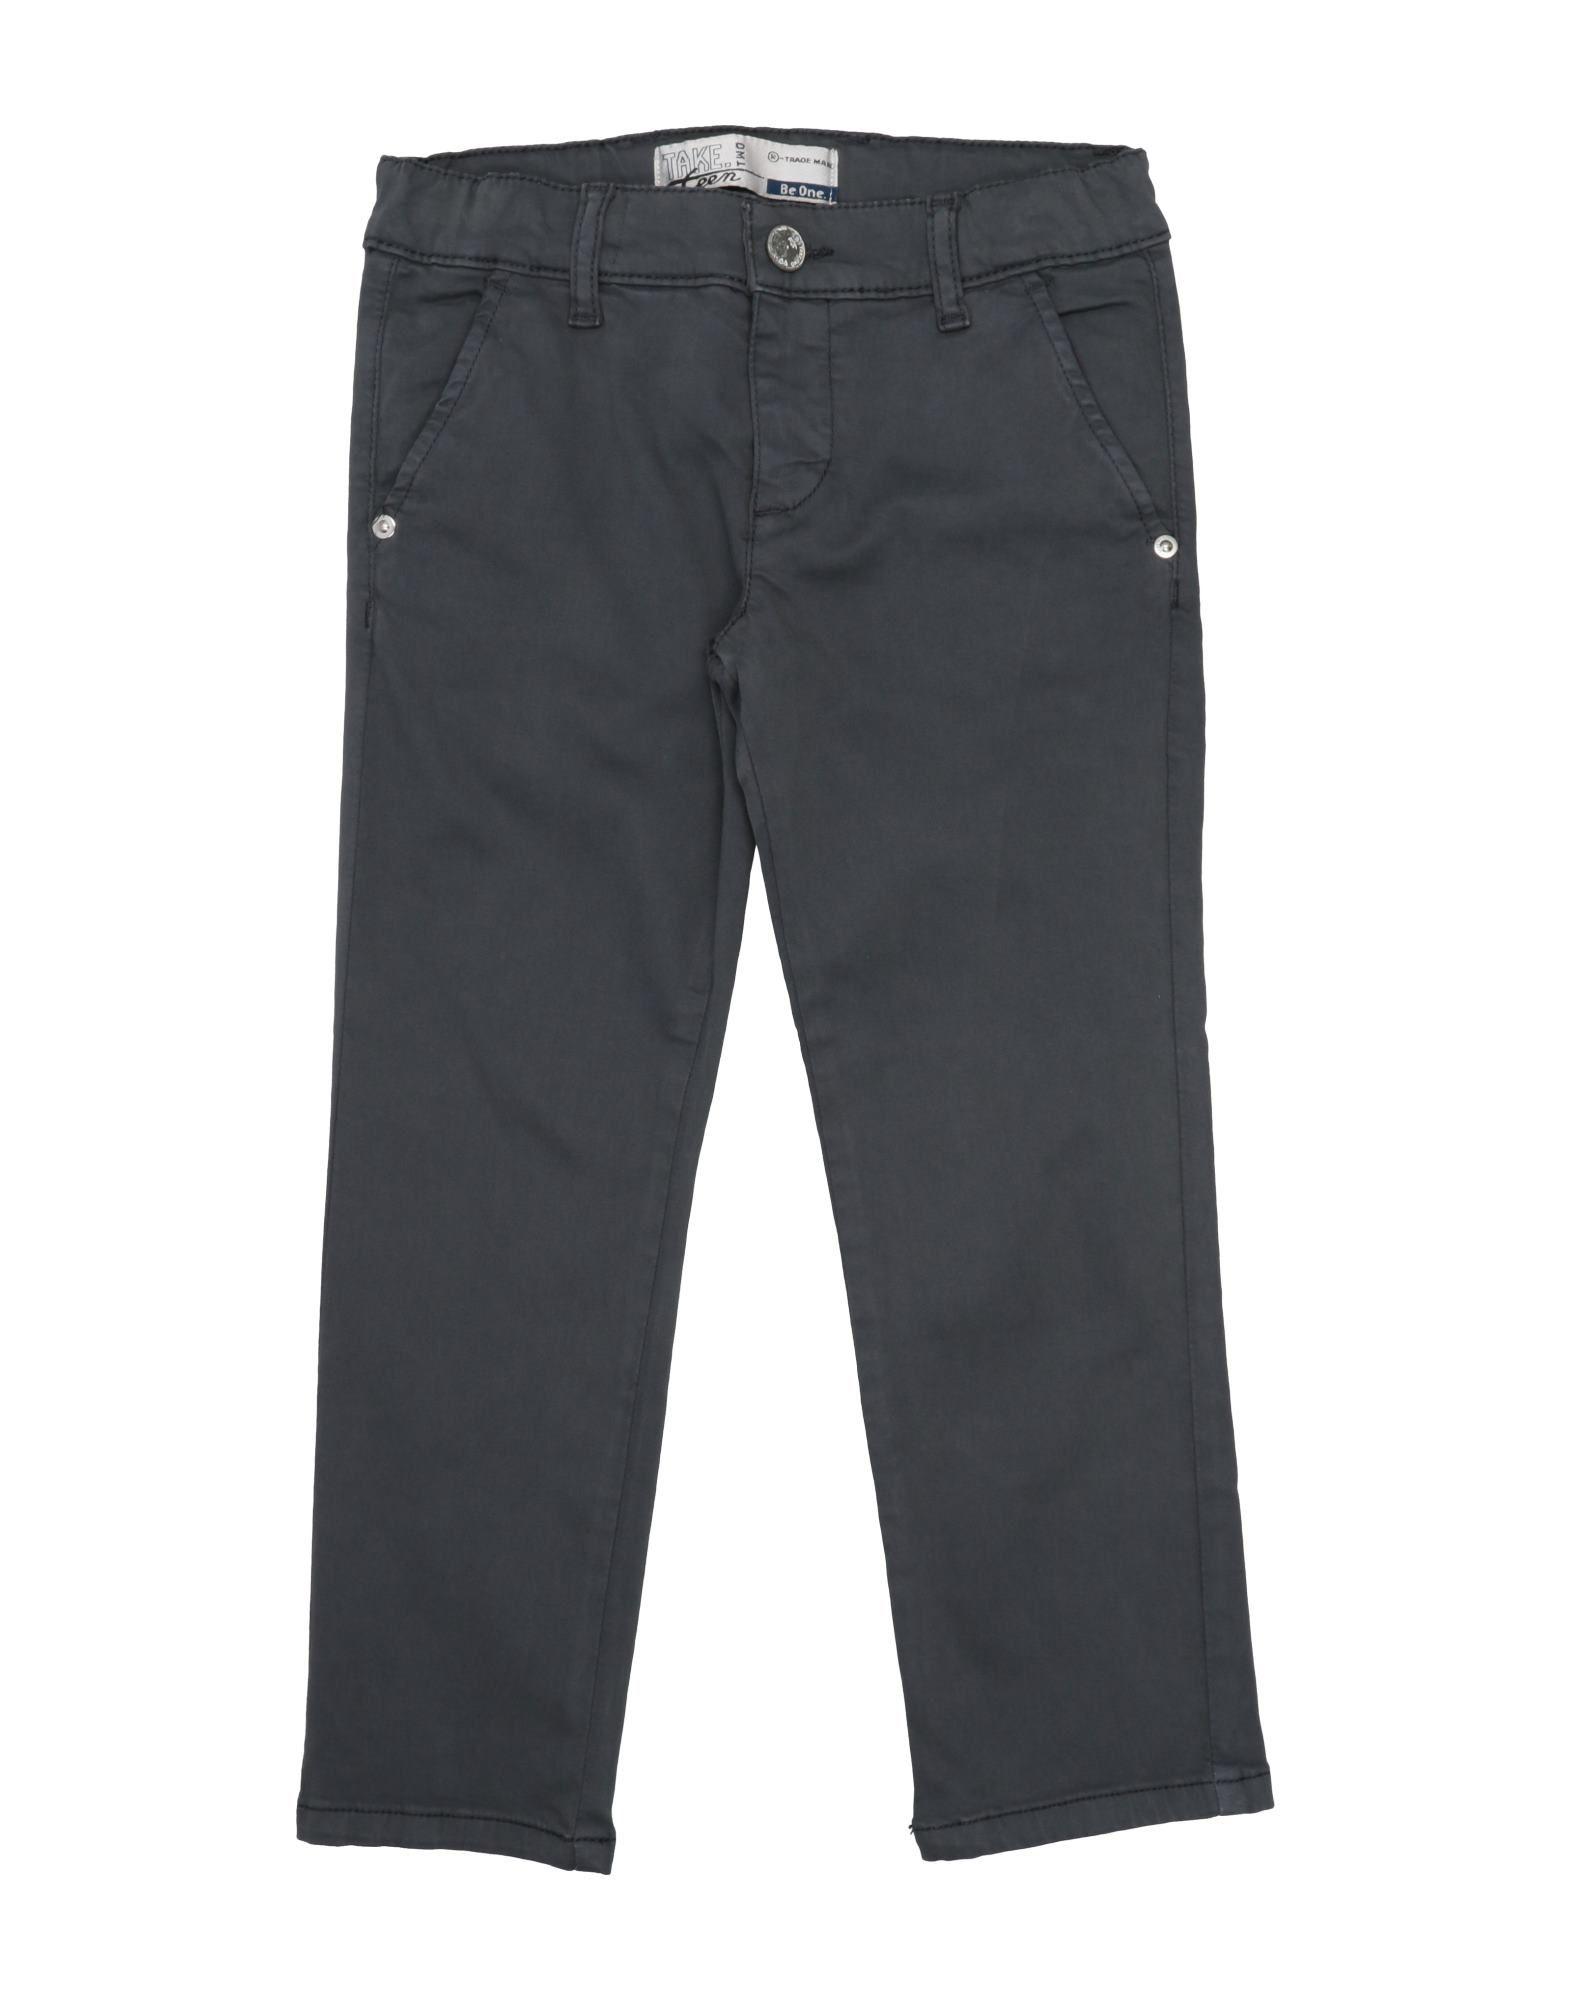 Take-two Teen Kids' Casual Pants In Gray